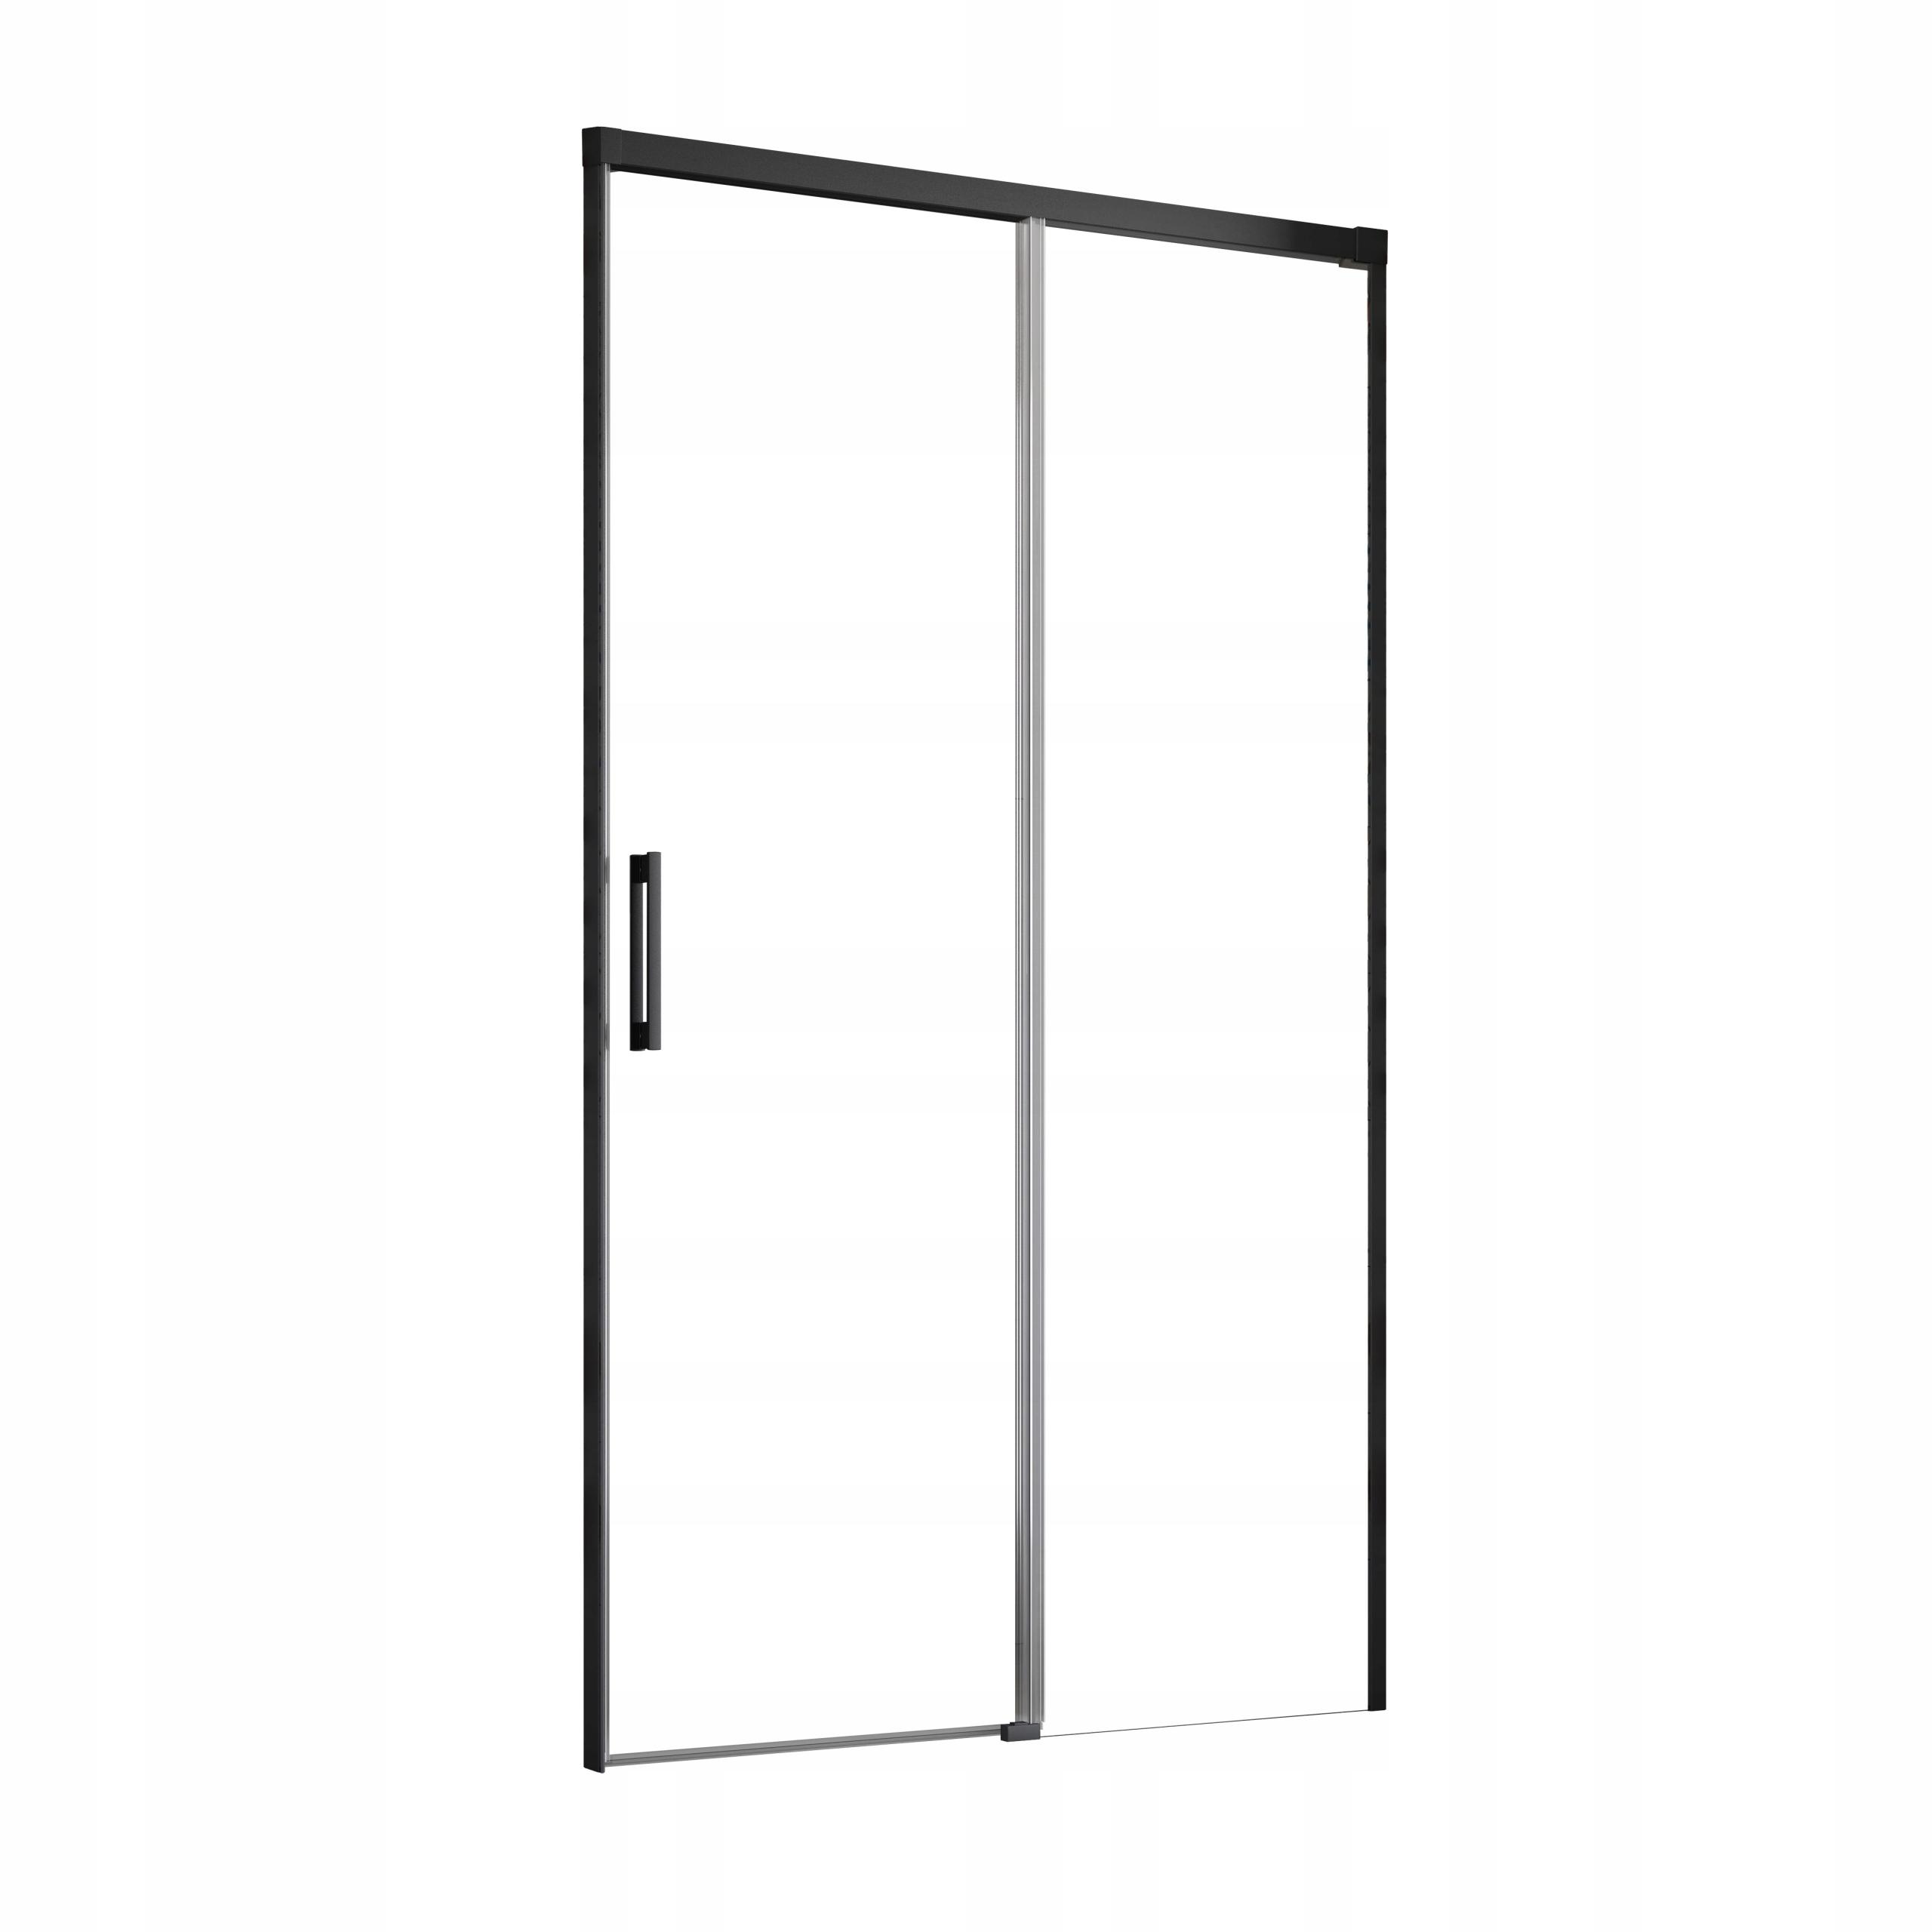 Idea Black sprchové dvere DWJ 110x200 RADAWAY